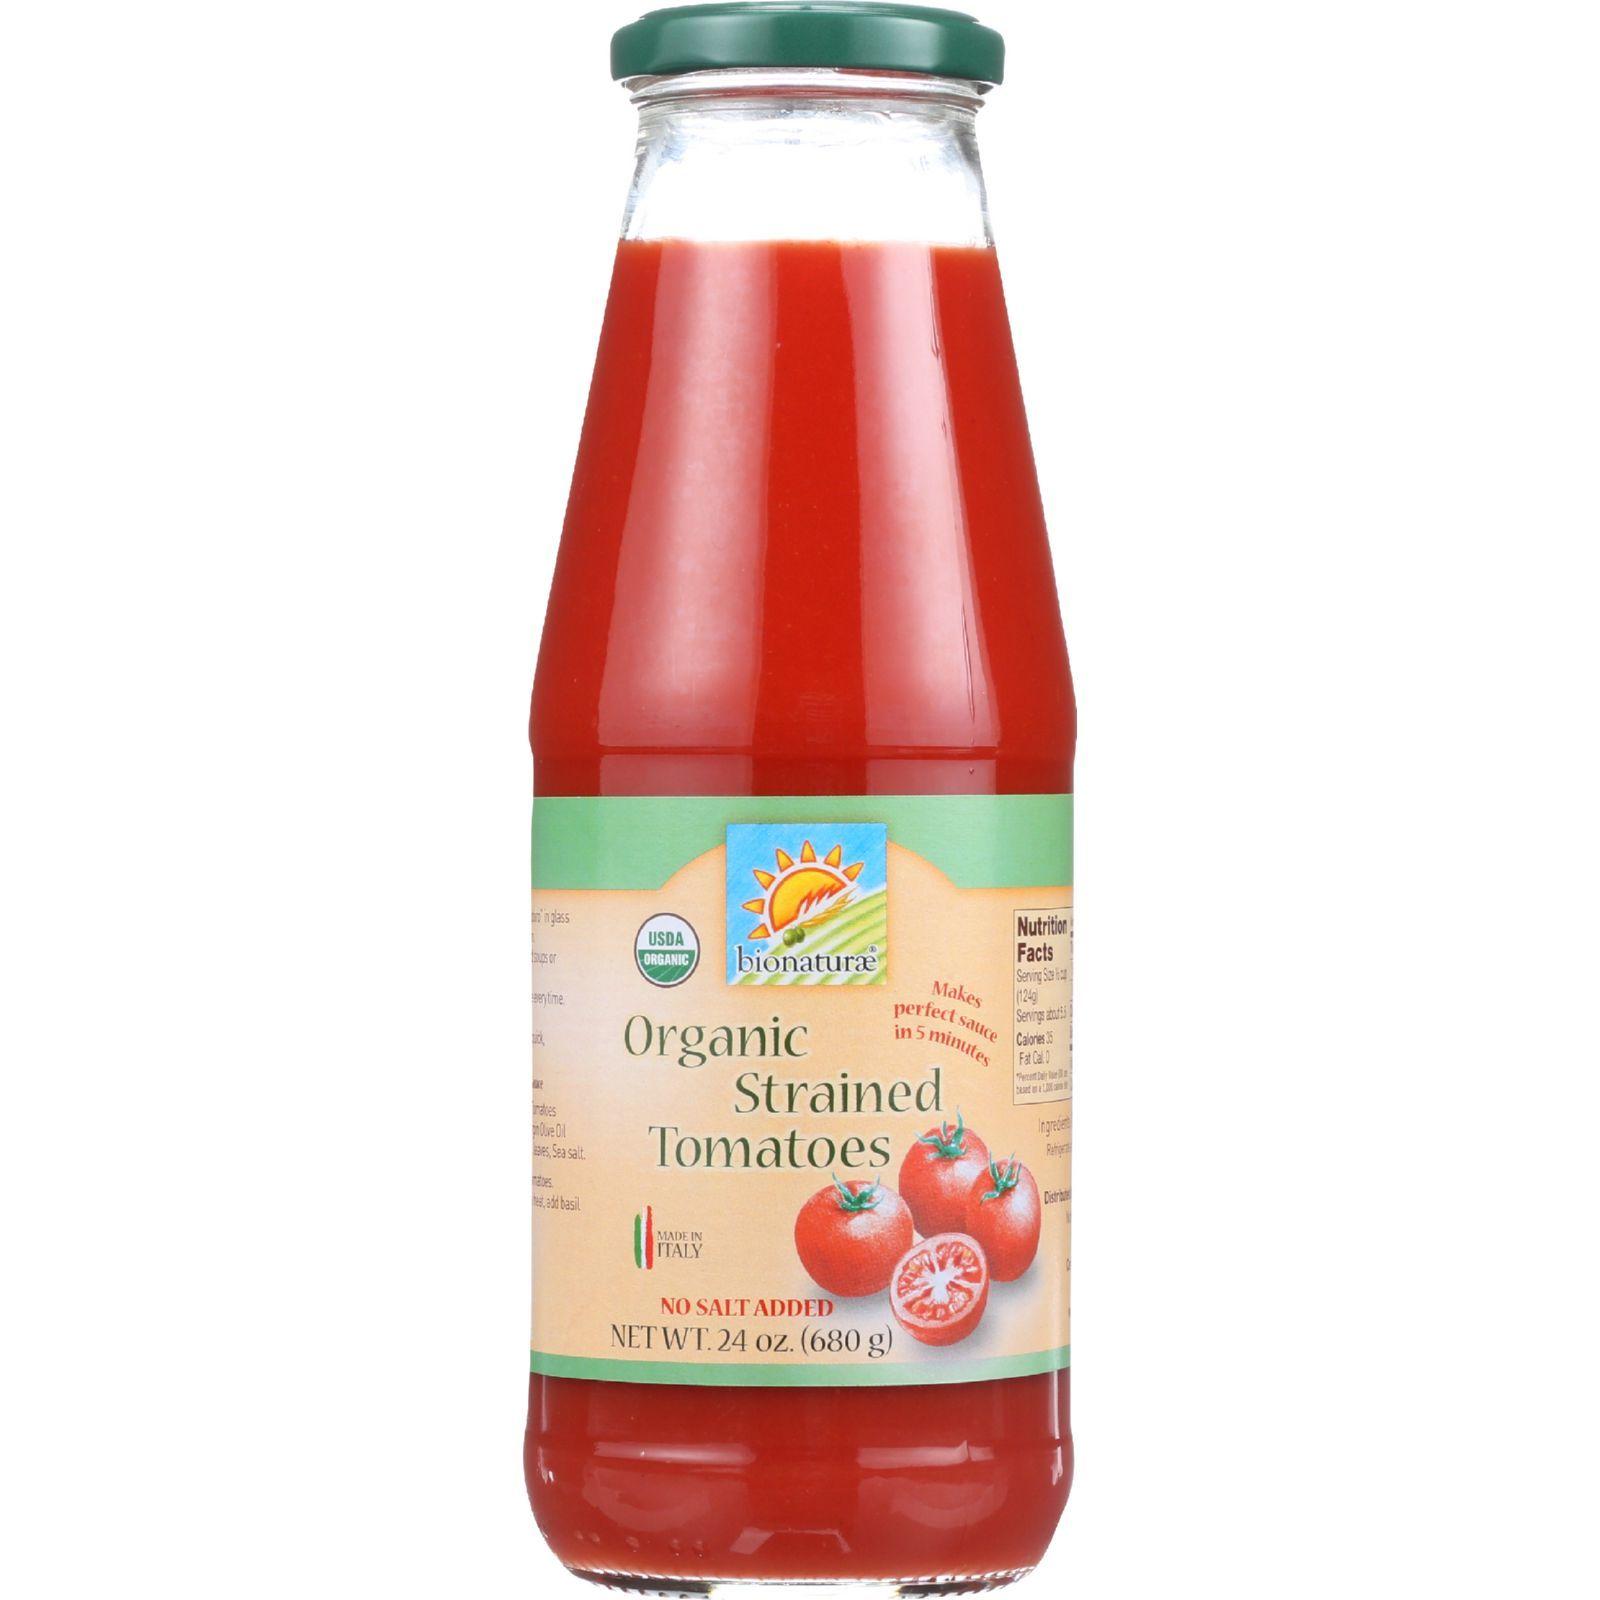 Bionaturae Tomatoes - Organic - Strained - 24 oz - case of 6